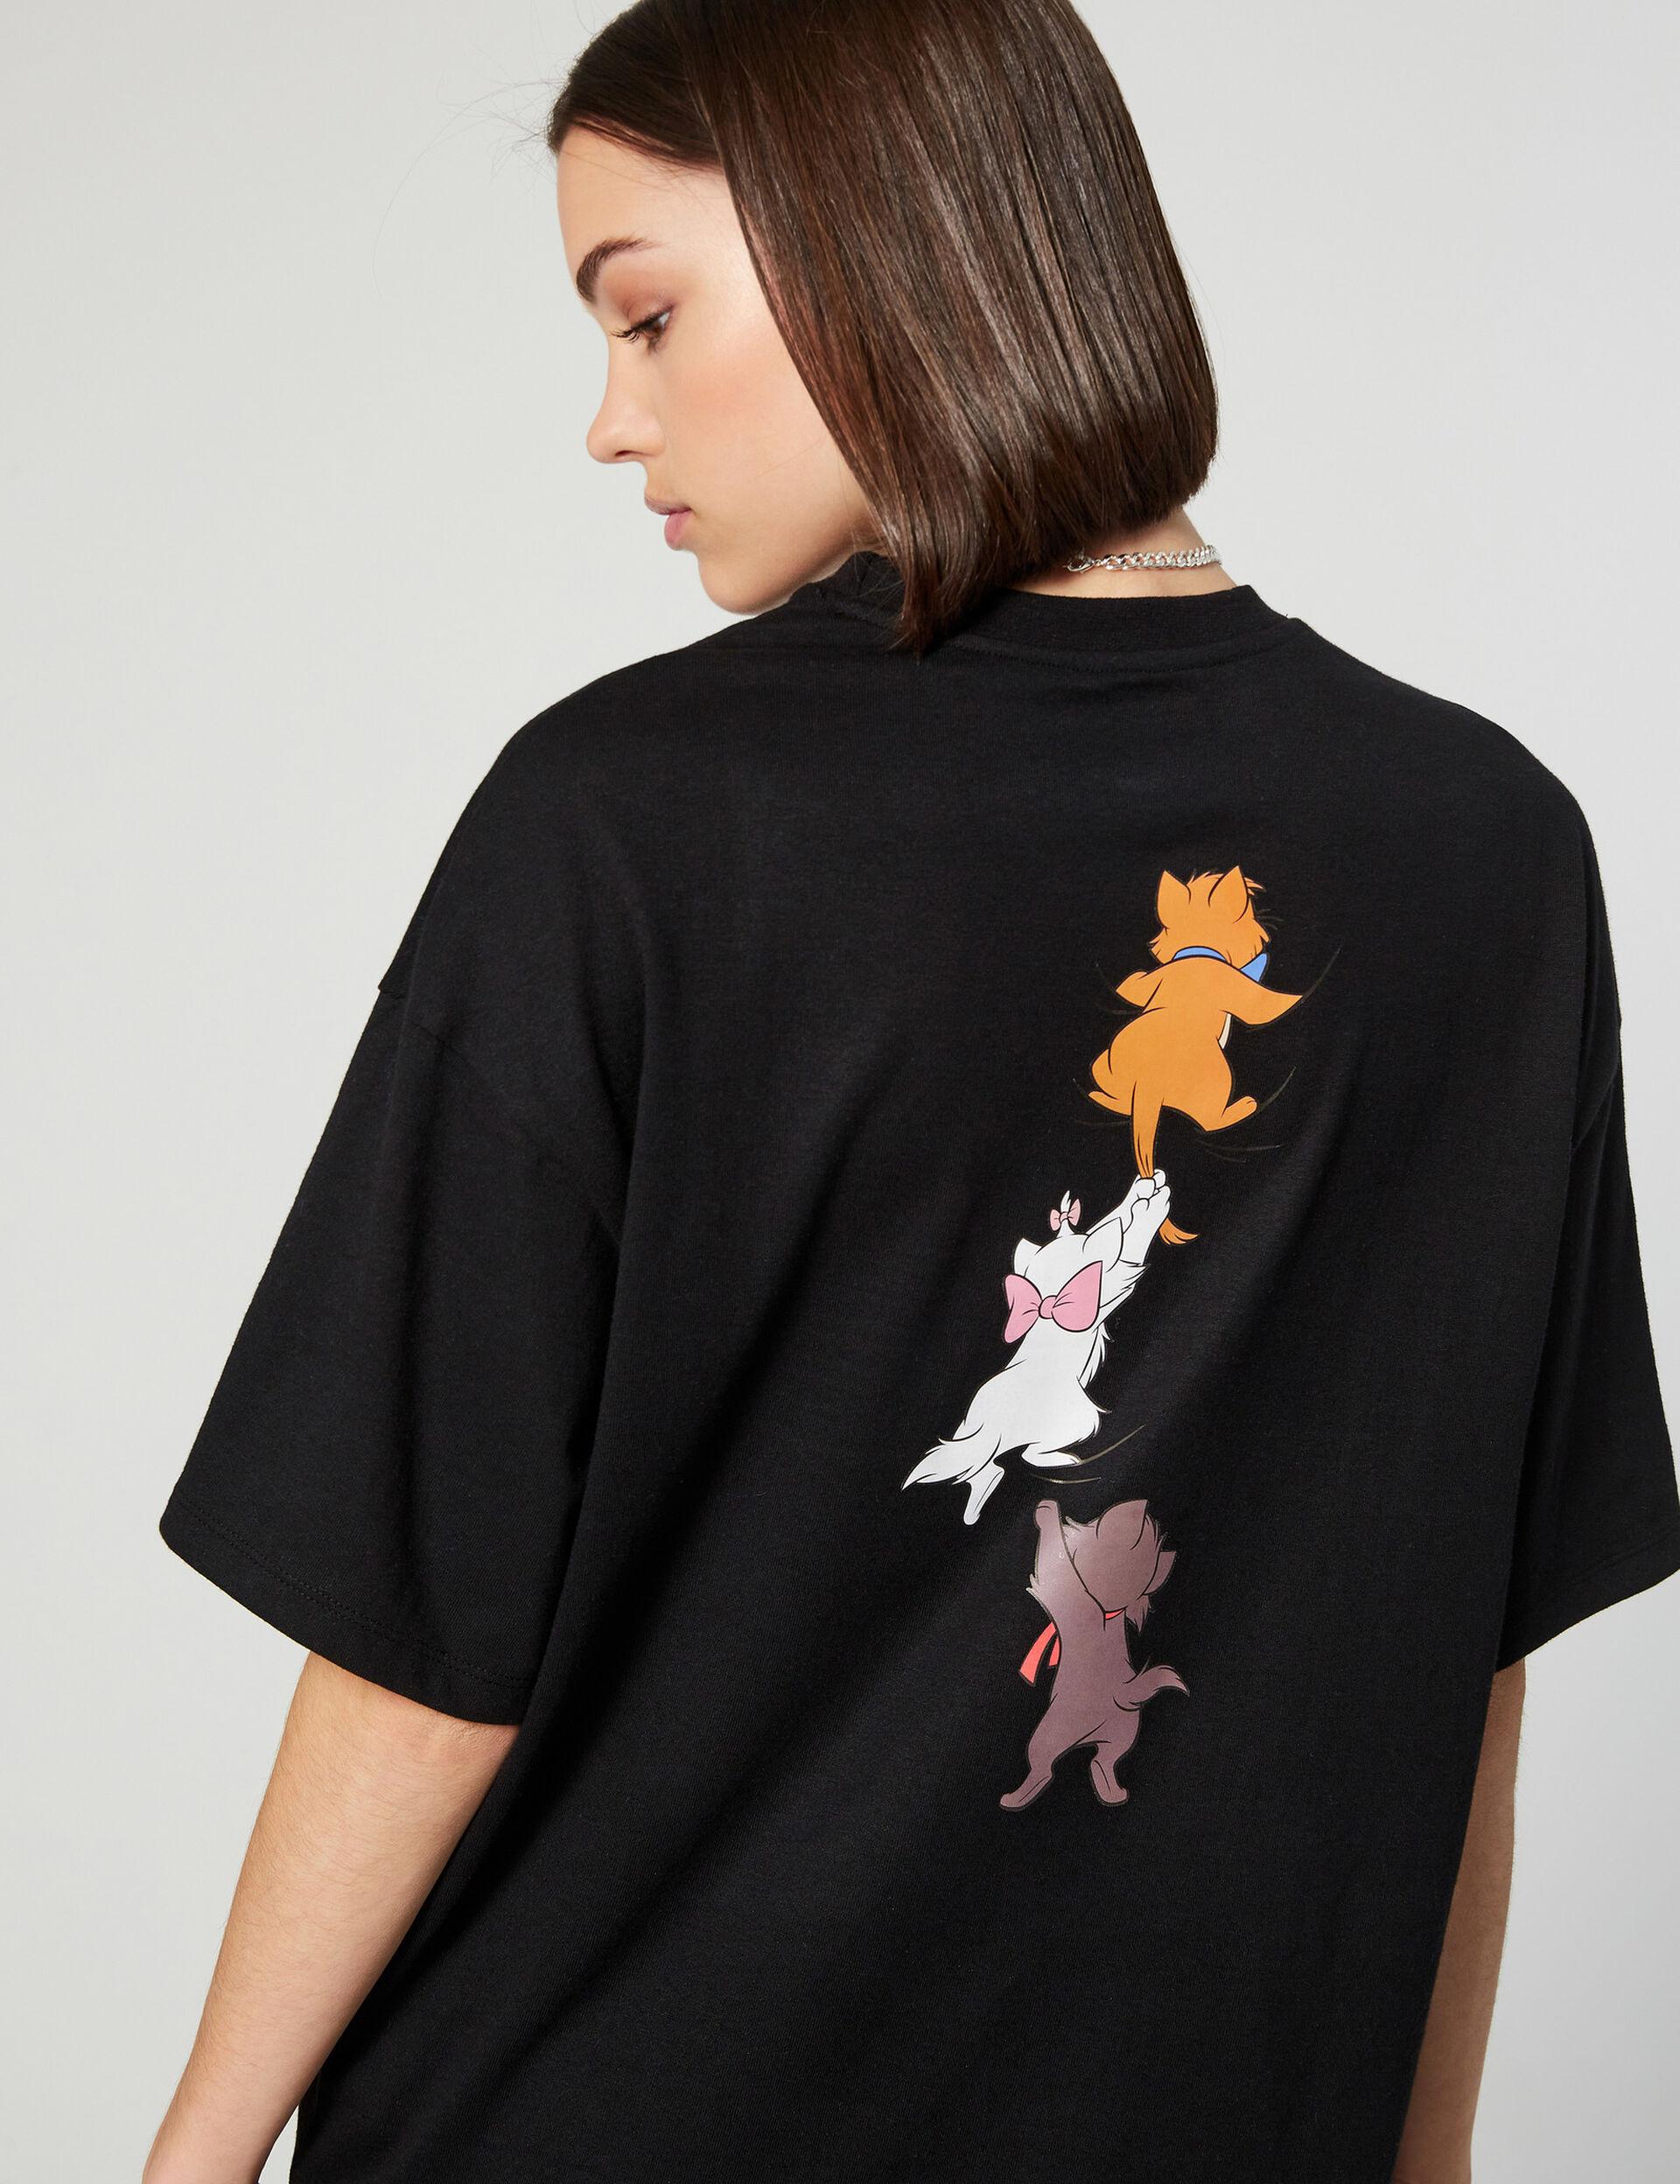 Tee-shirt Disney Les Aristochats